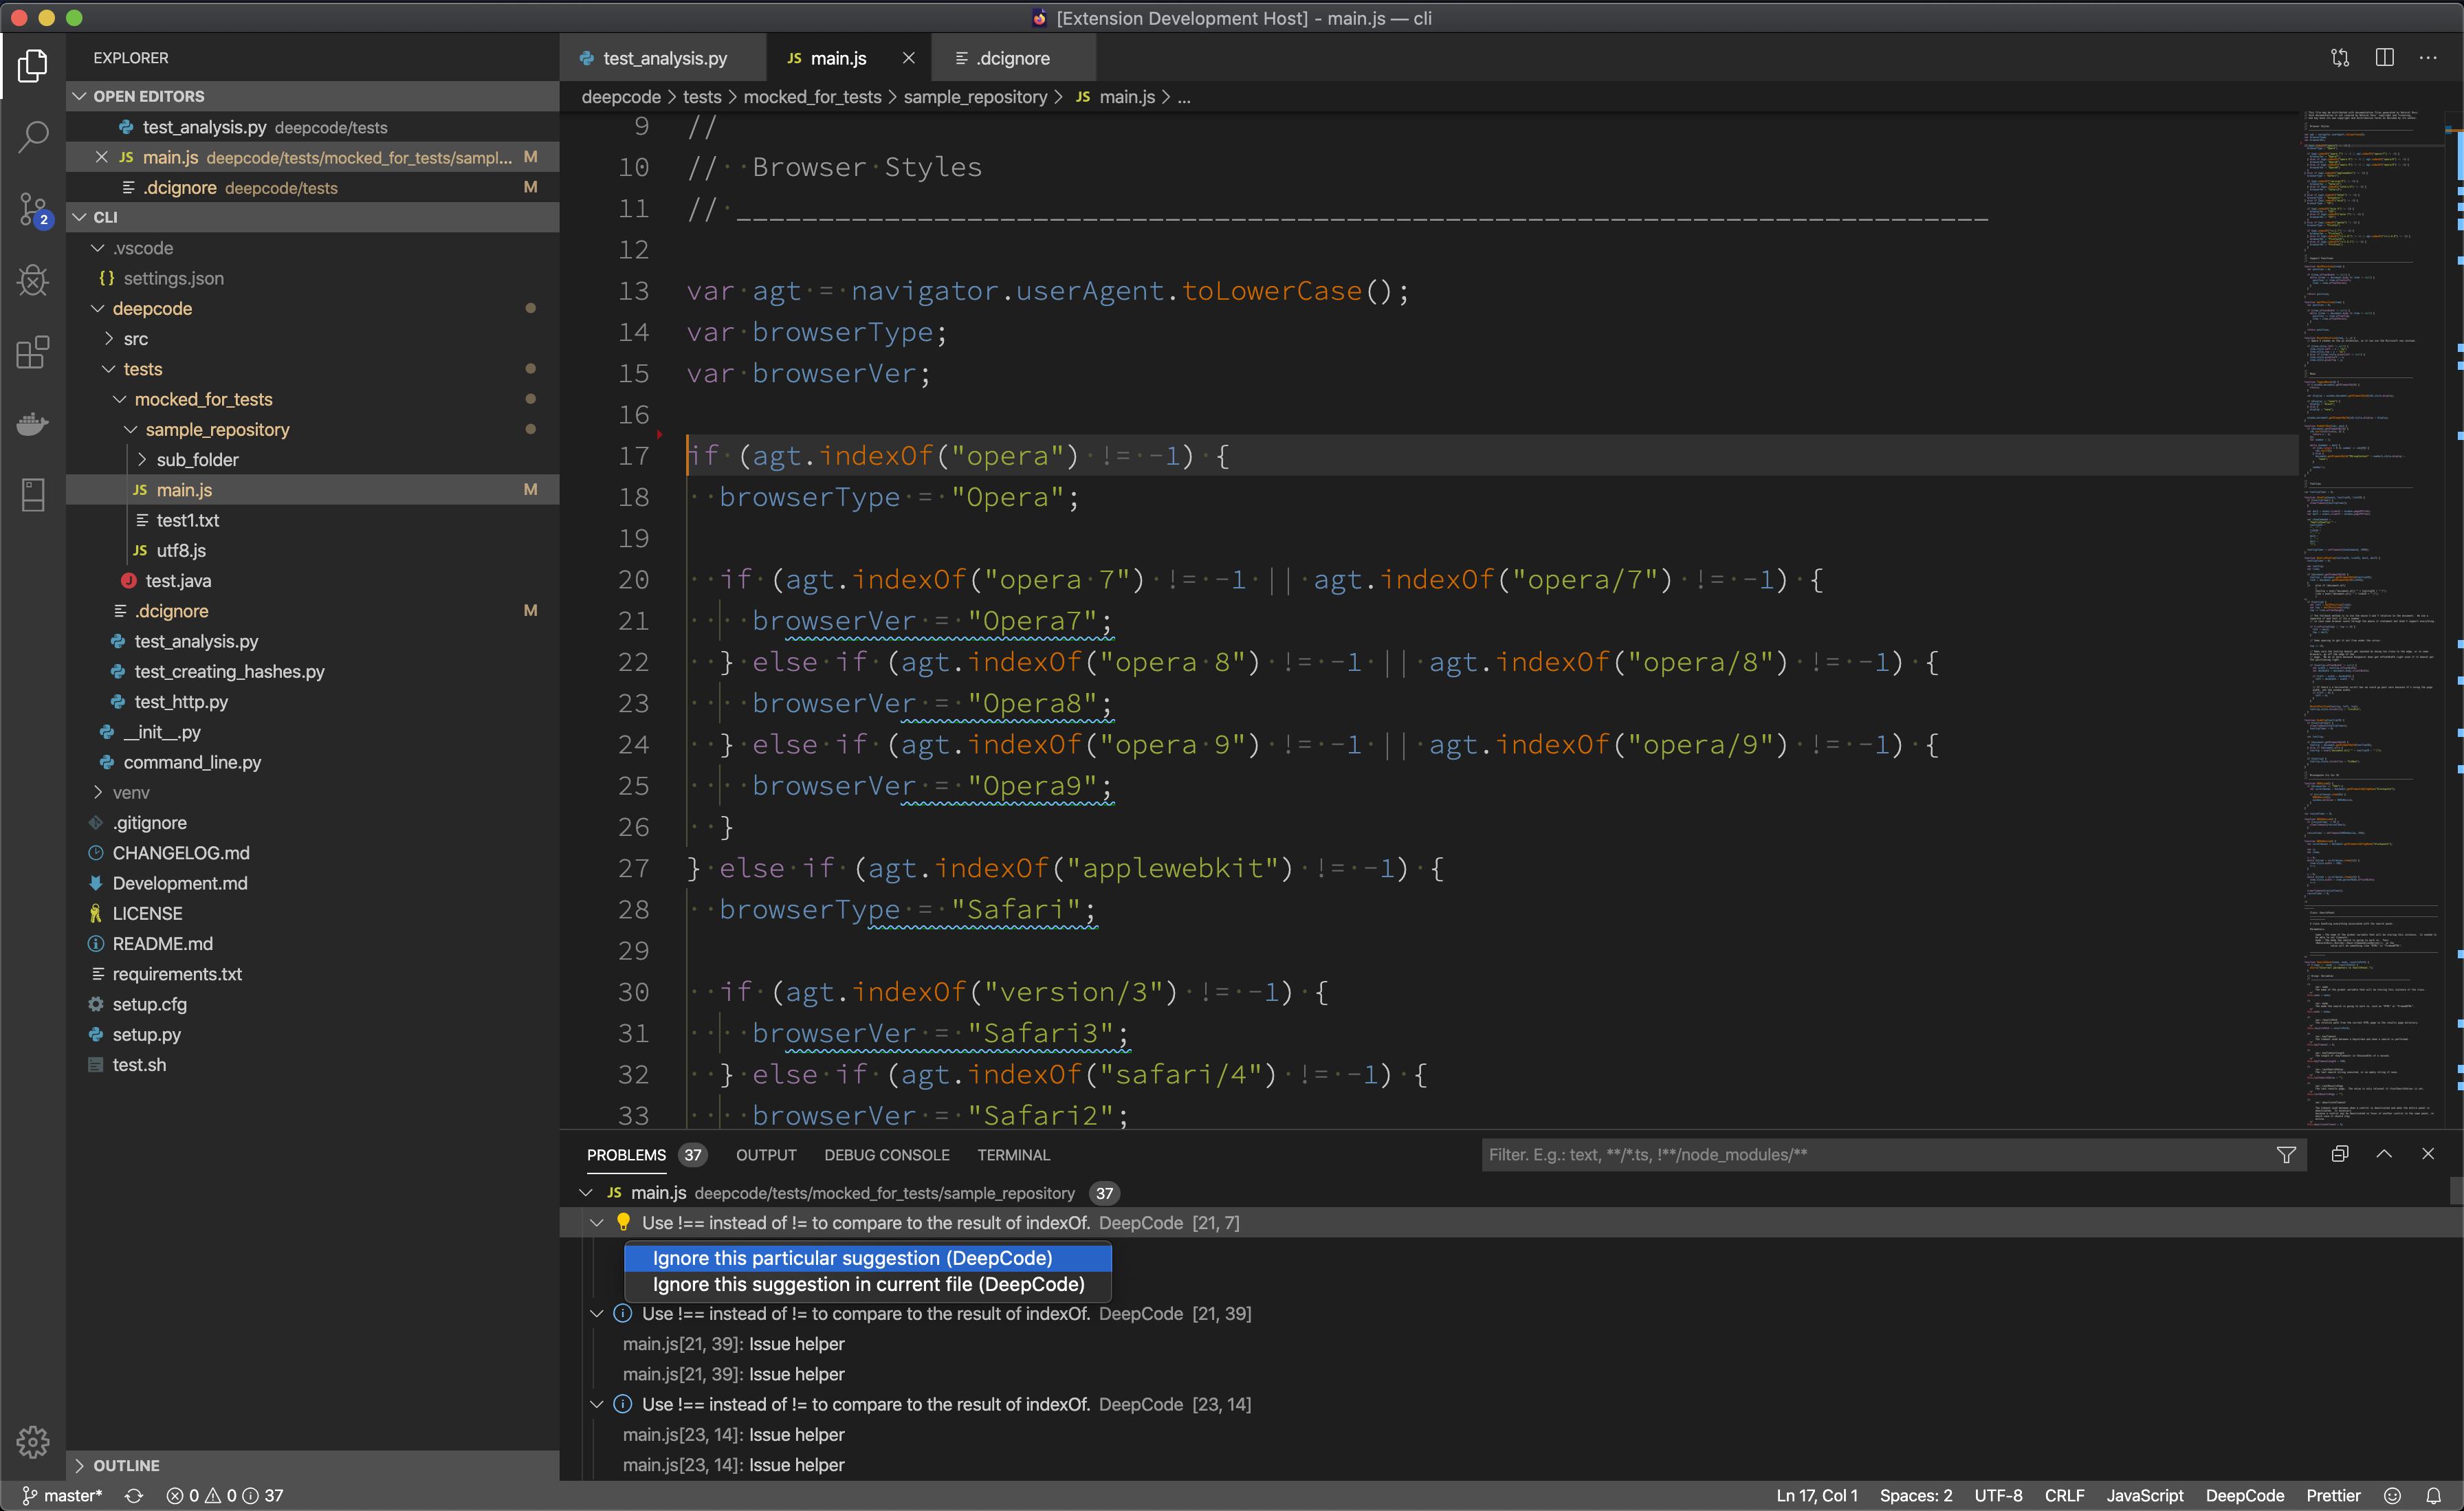 deepcode ignore menu